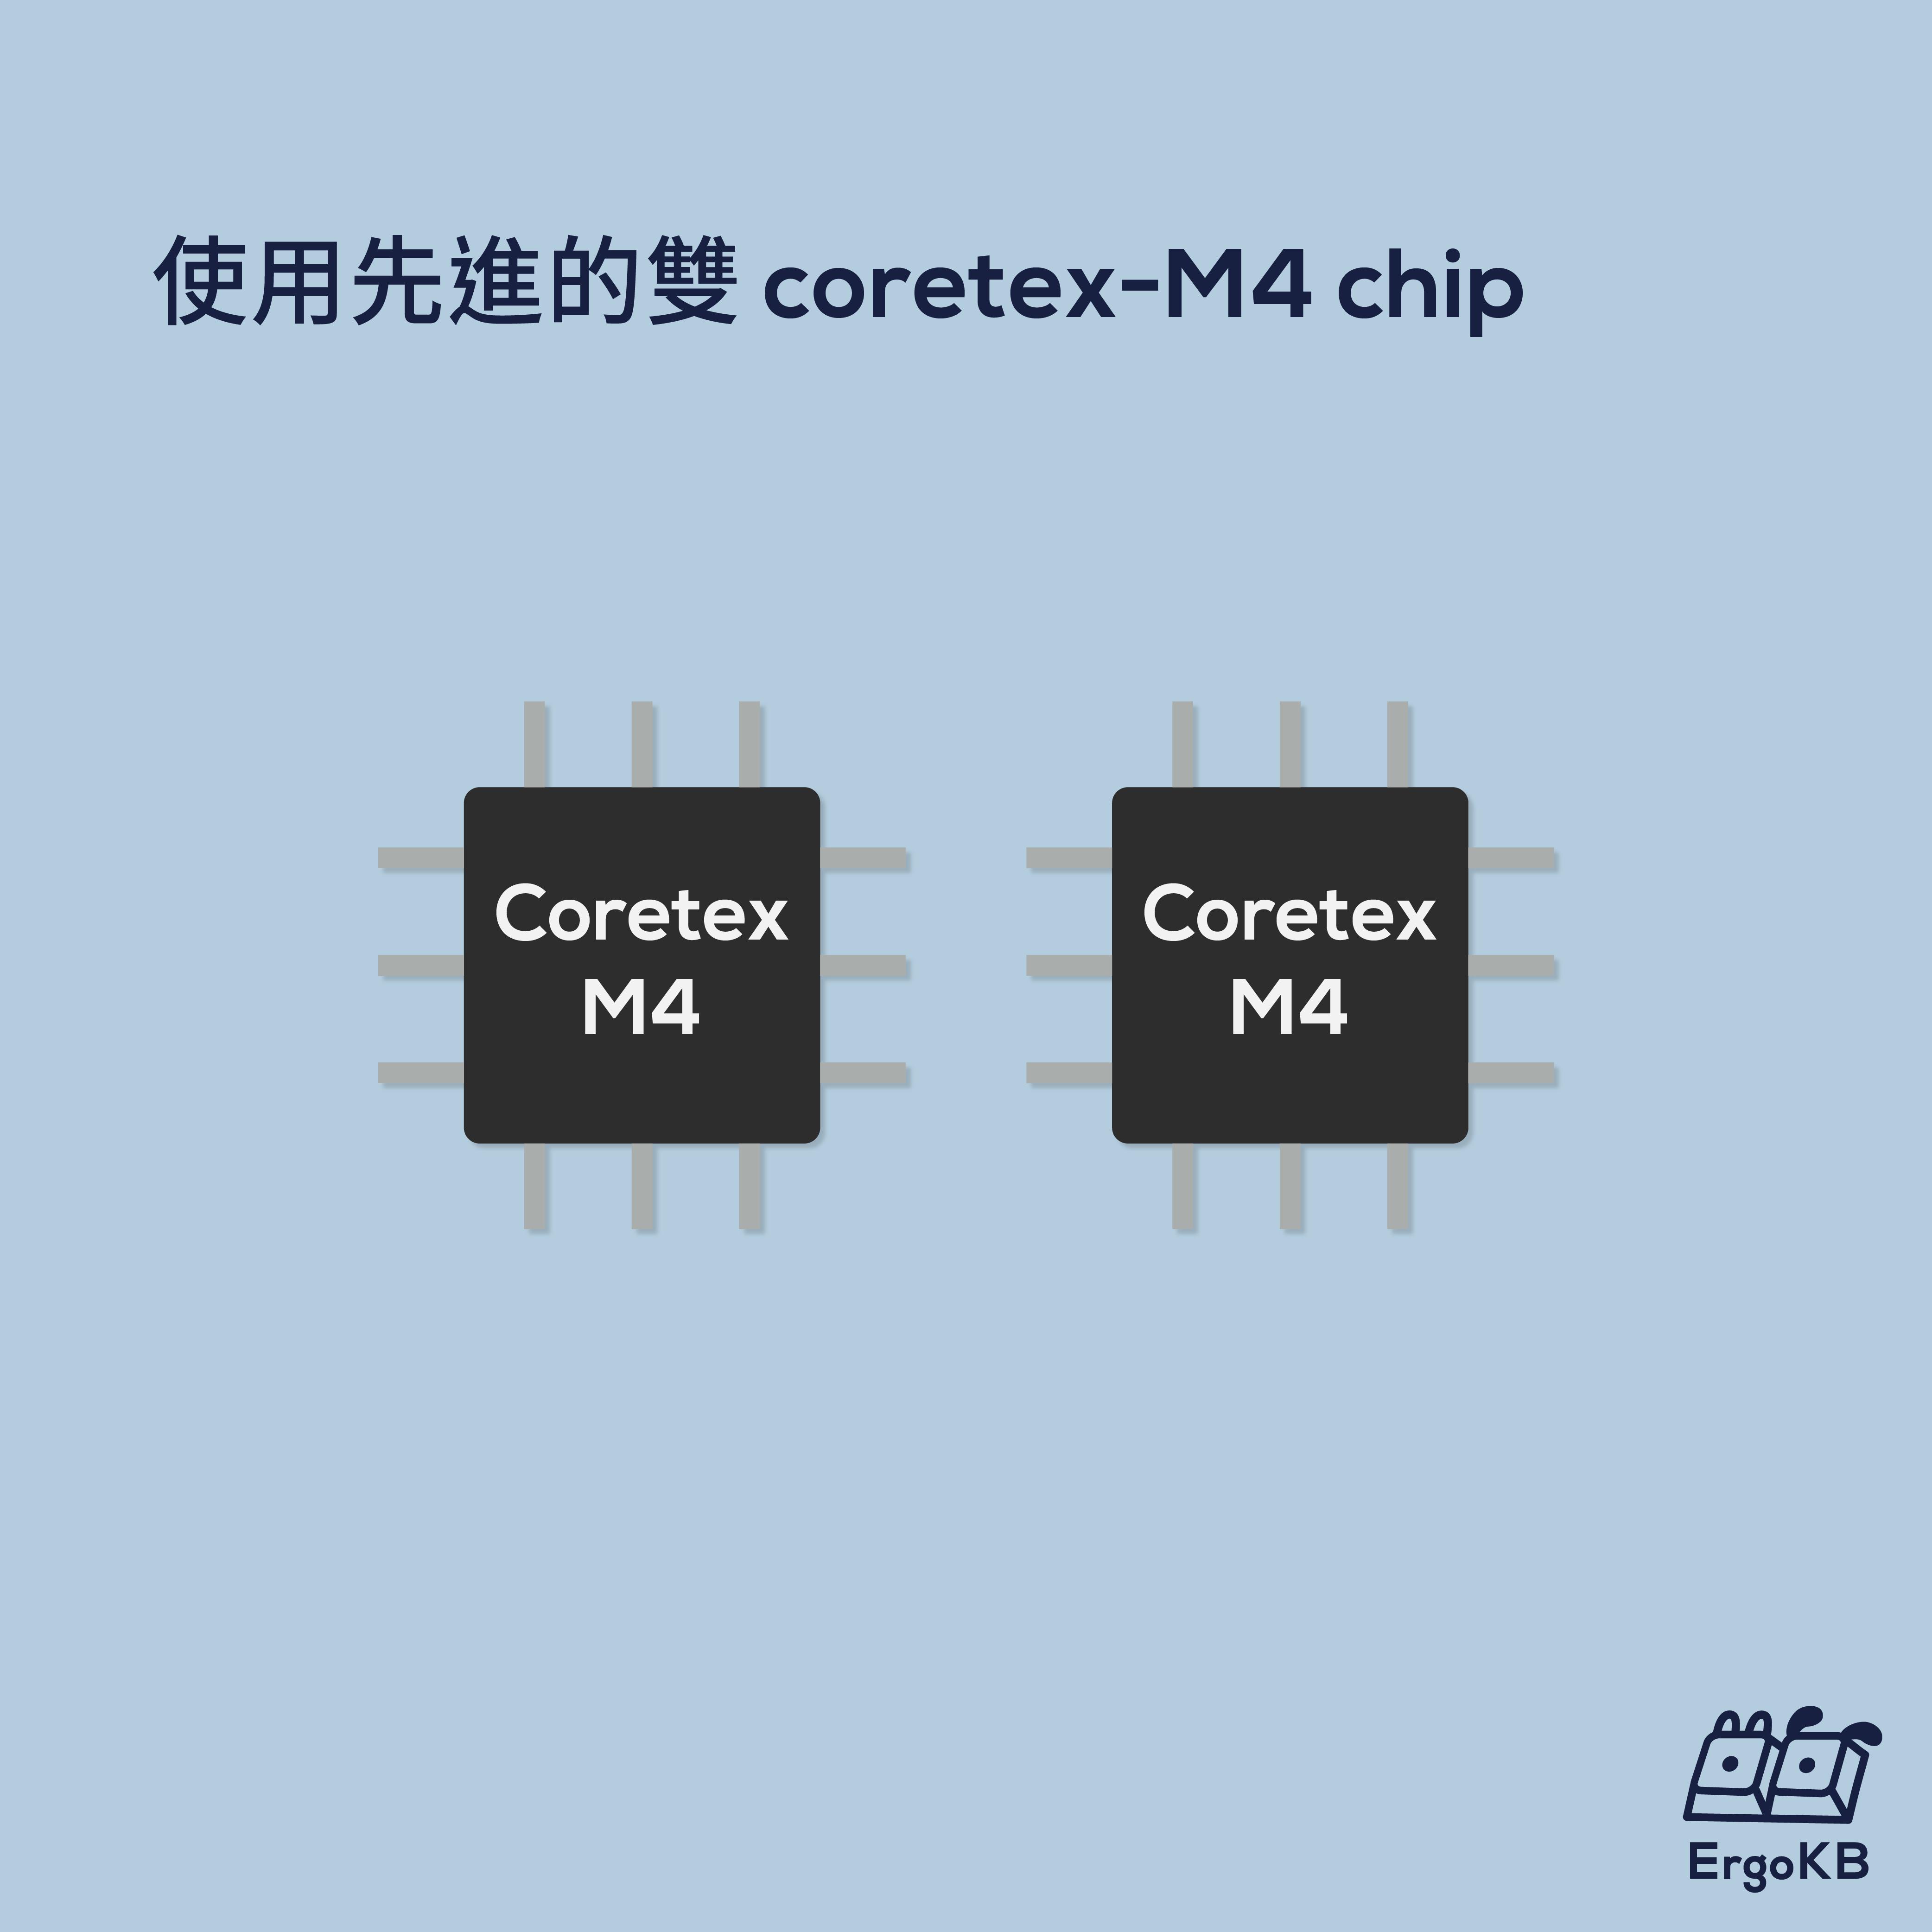 使用先進的雙 Cortex-M4 chip